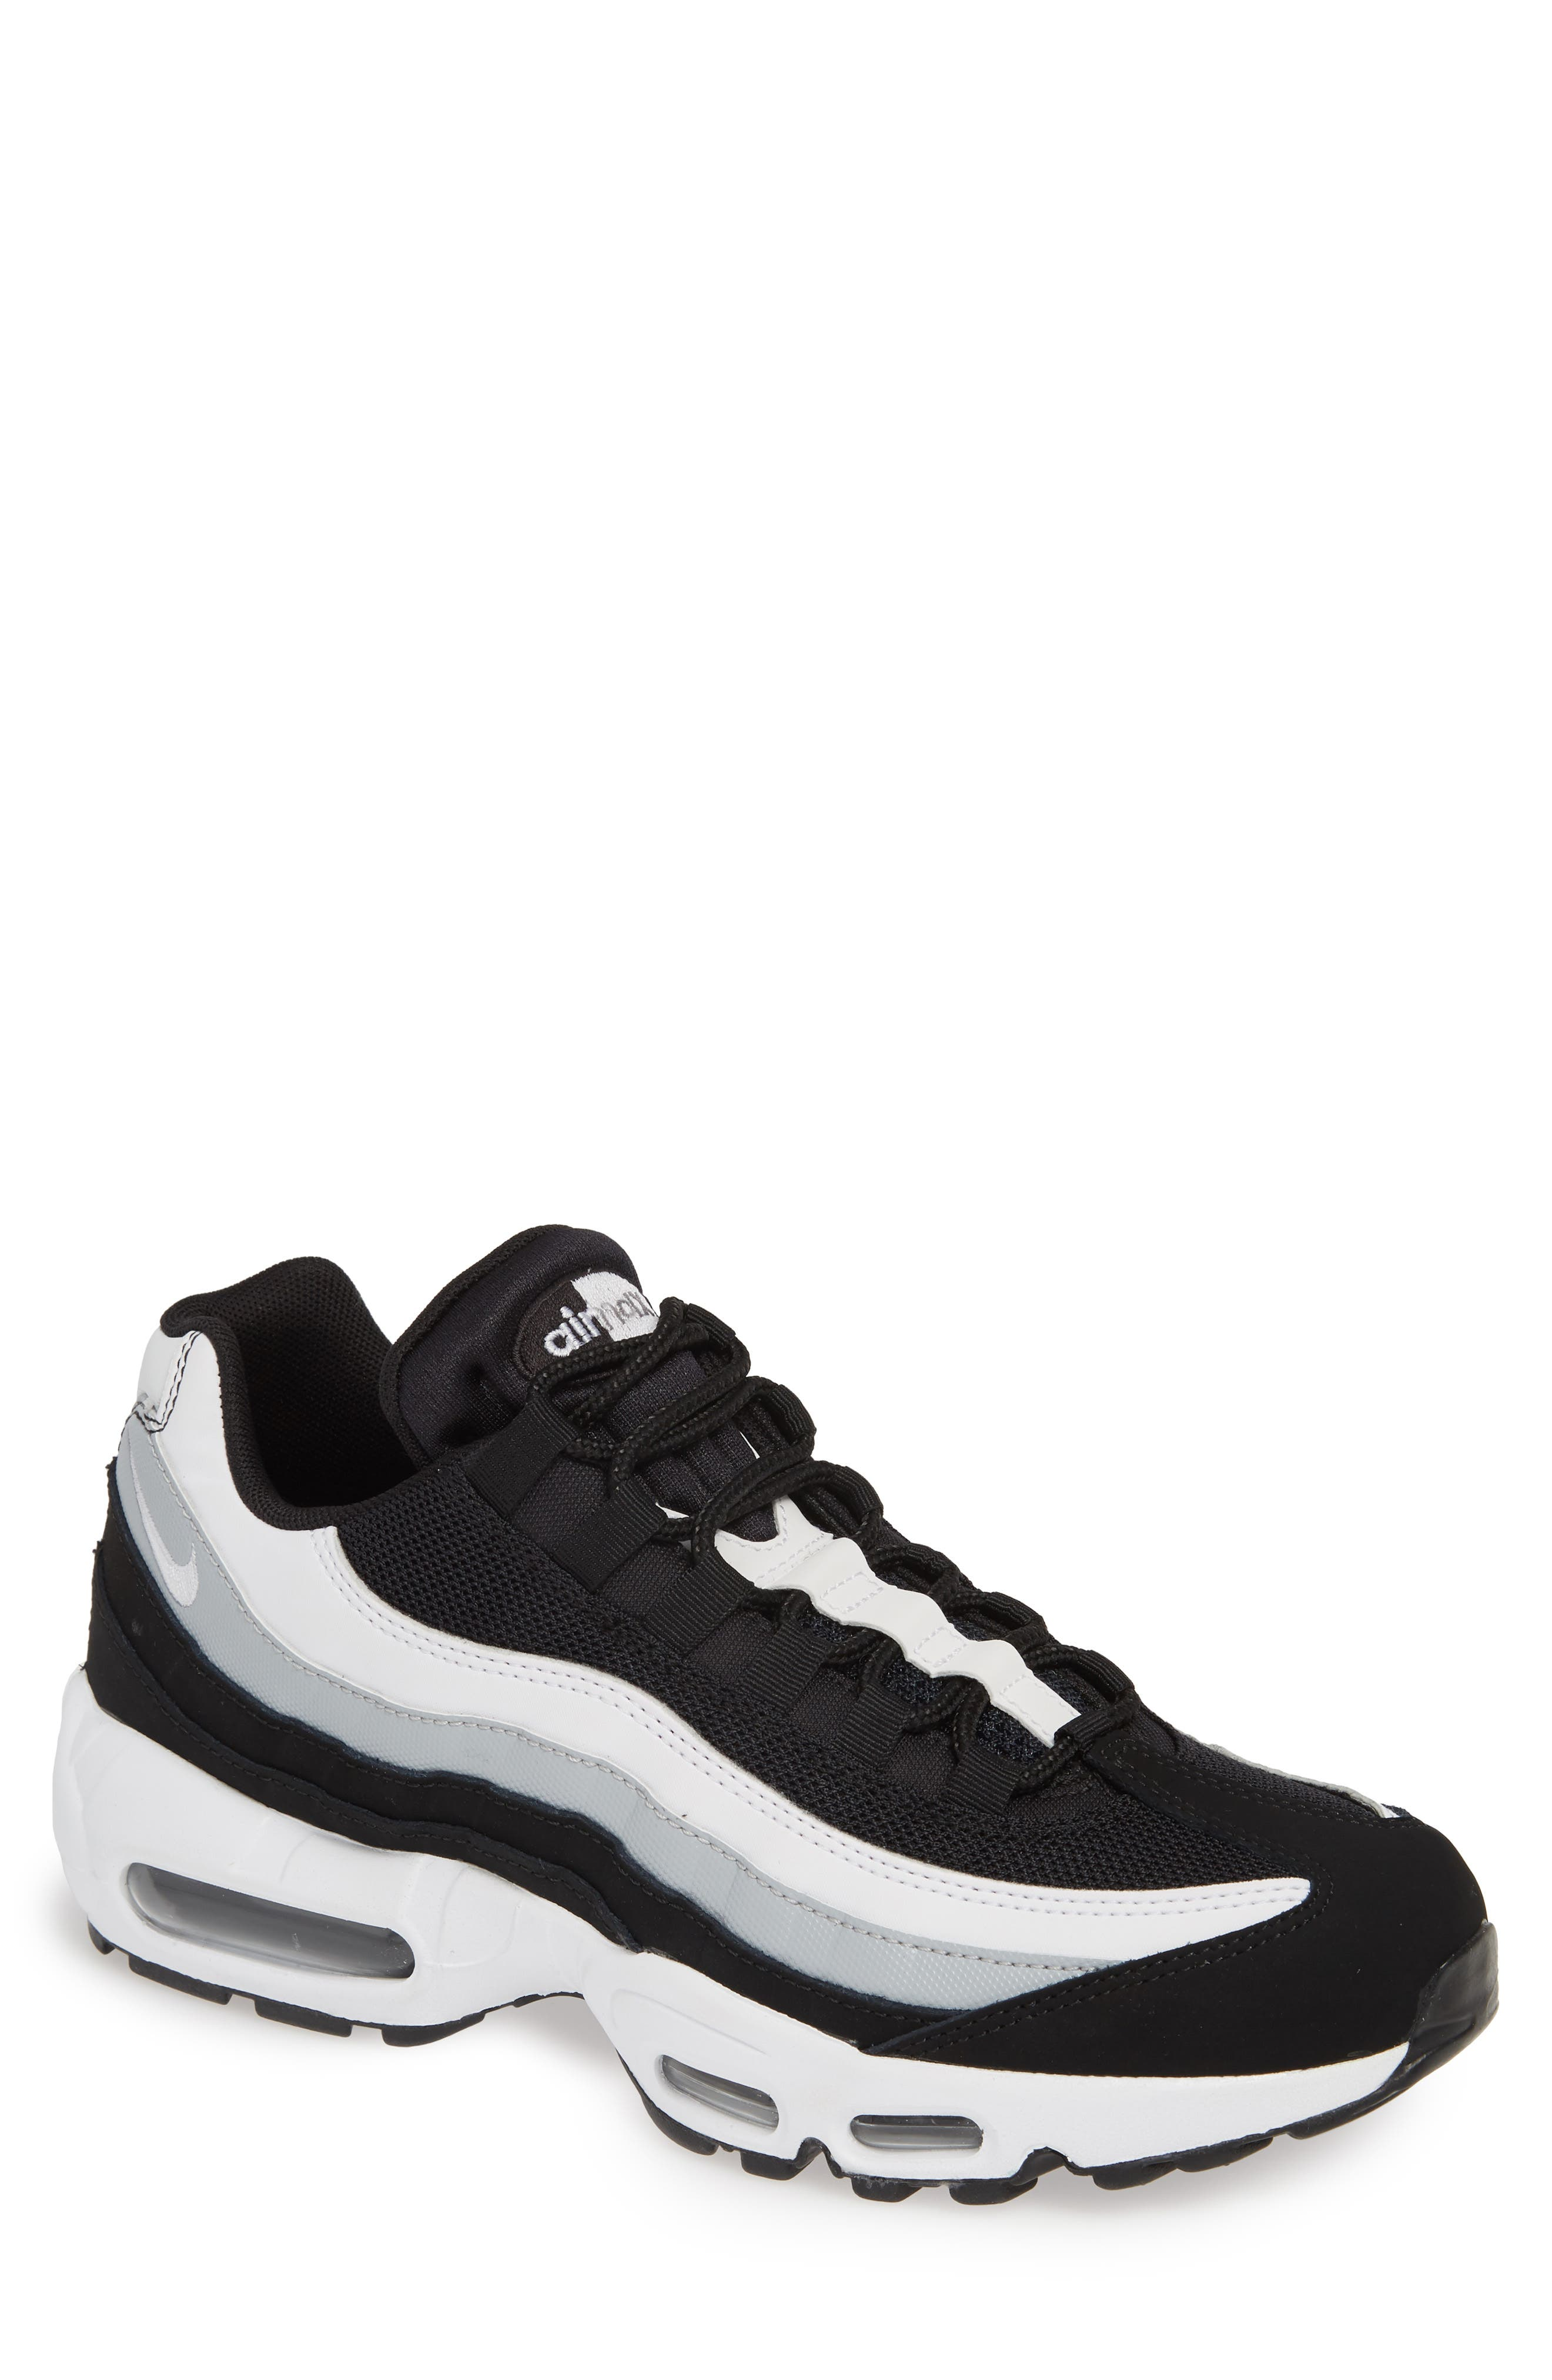 NIKE,                             'Air Max 95 Essential' Sneaker,                             Main thumbnail 1, color,                             BLACK/ WHITE/ WOLF GREY